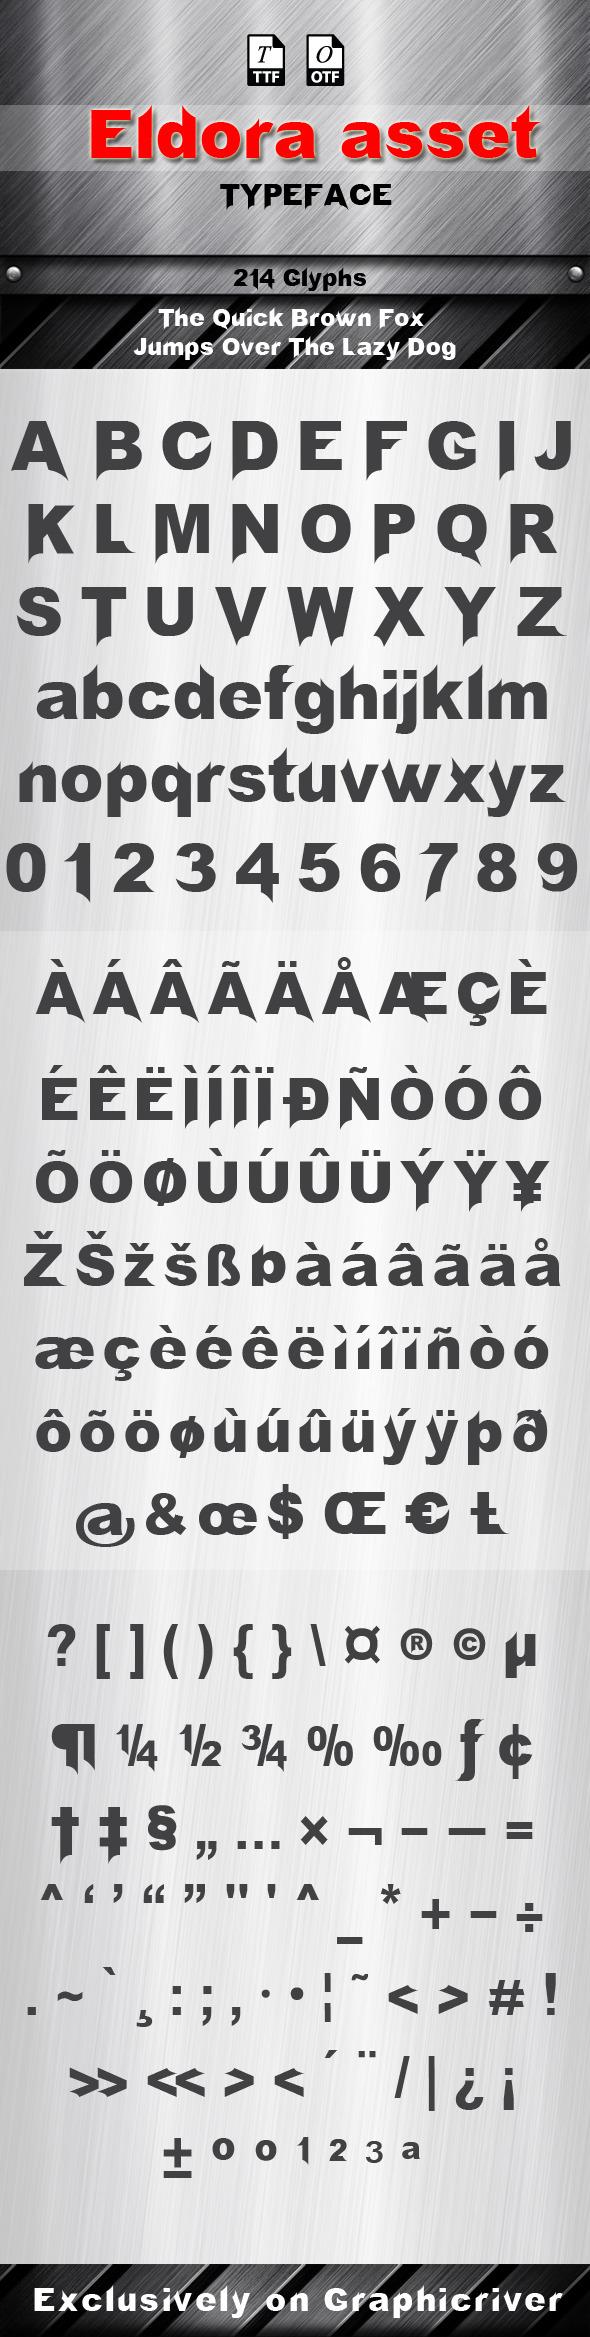 Eldora Asset Font - Futuristic Decorative